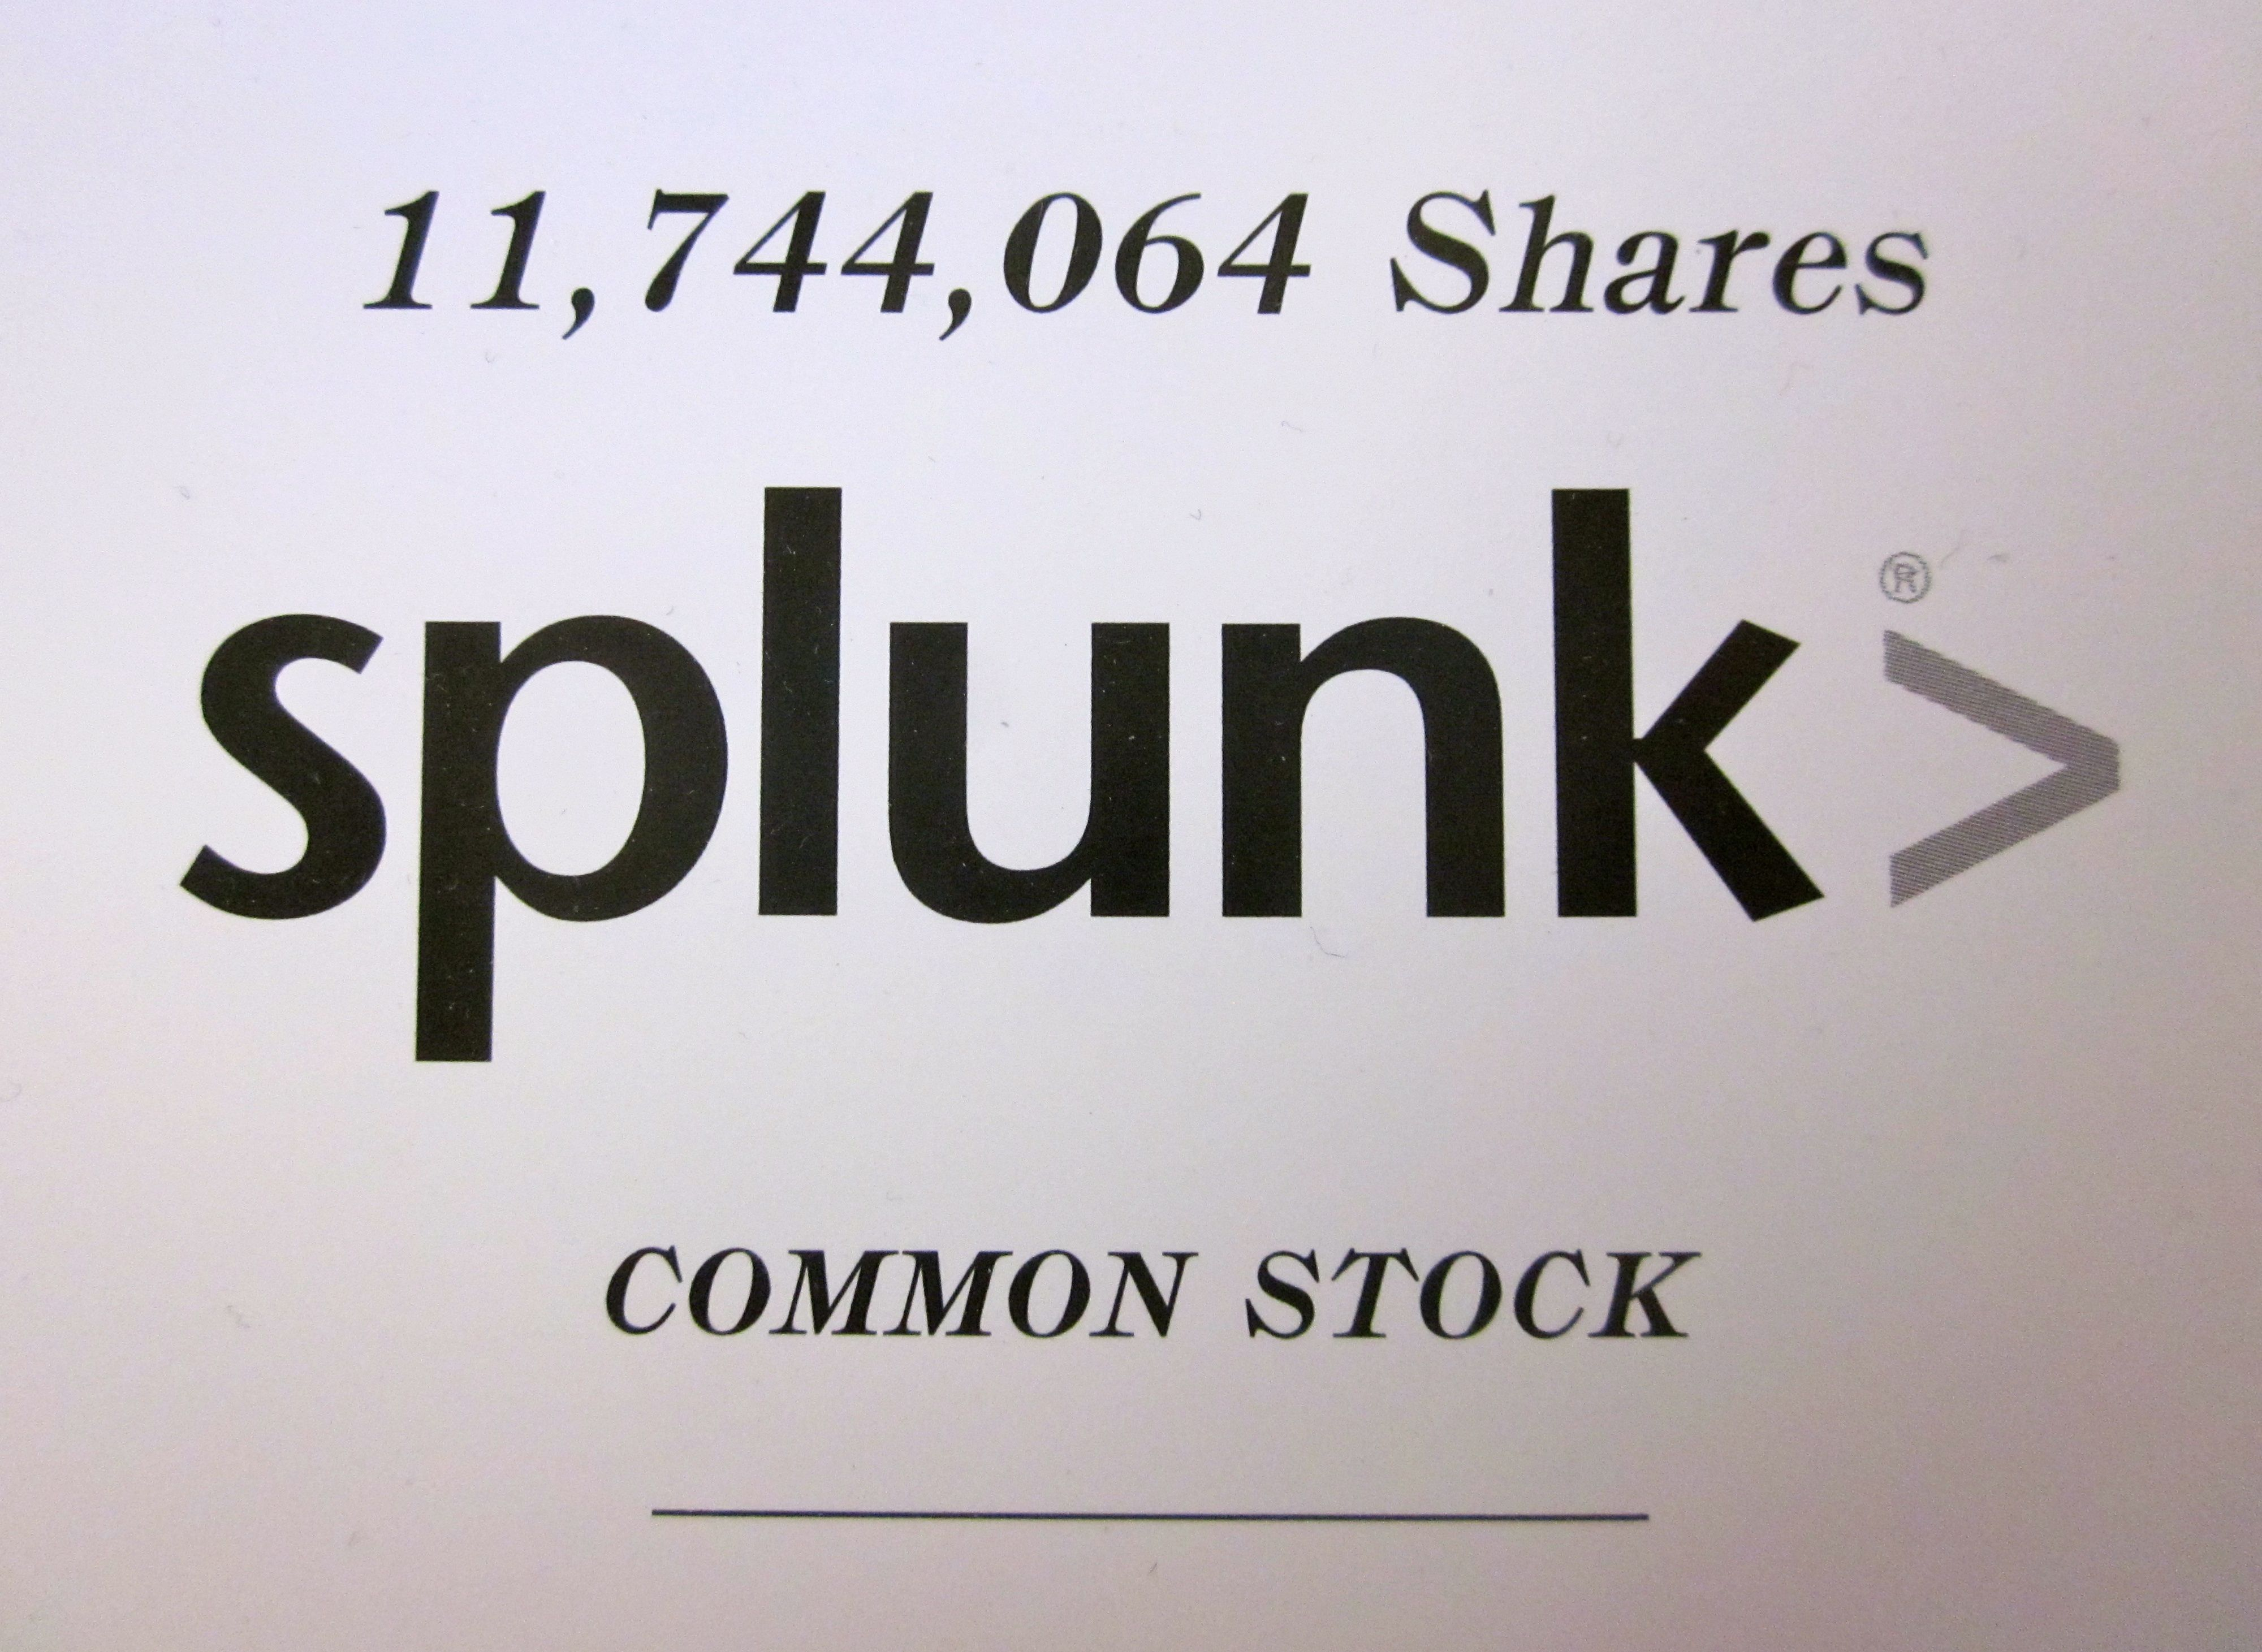 Splunk Prospectus, SPLK, Kingdom Ridge Capital, KRC, IPO